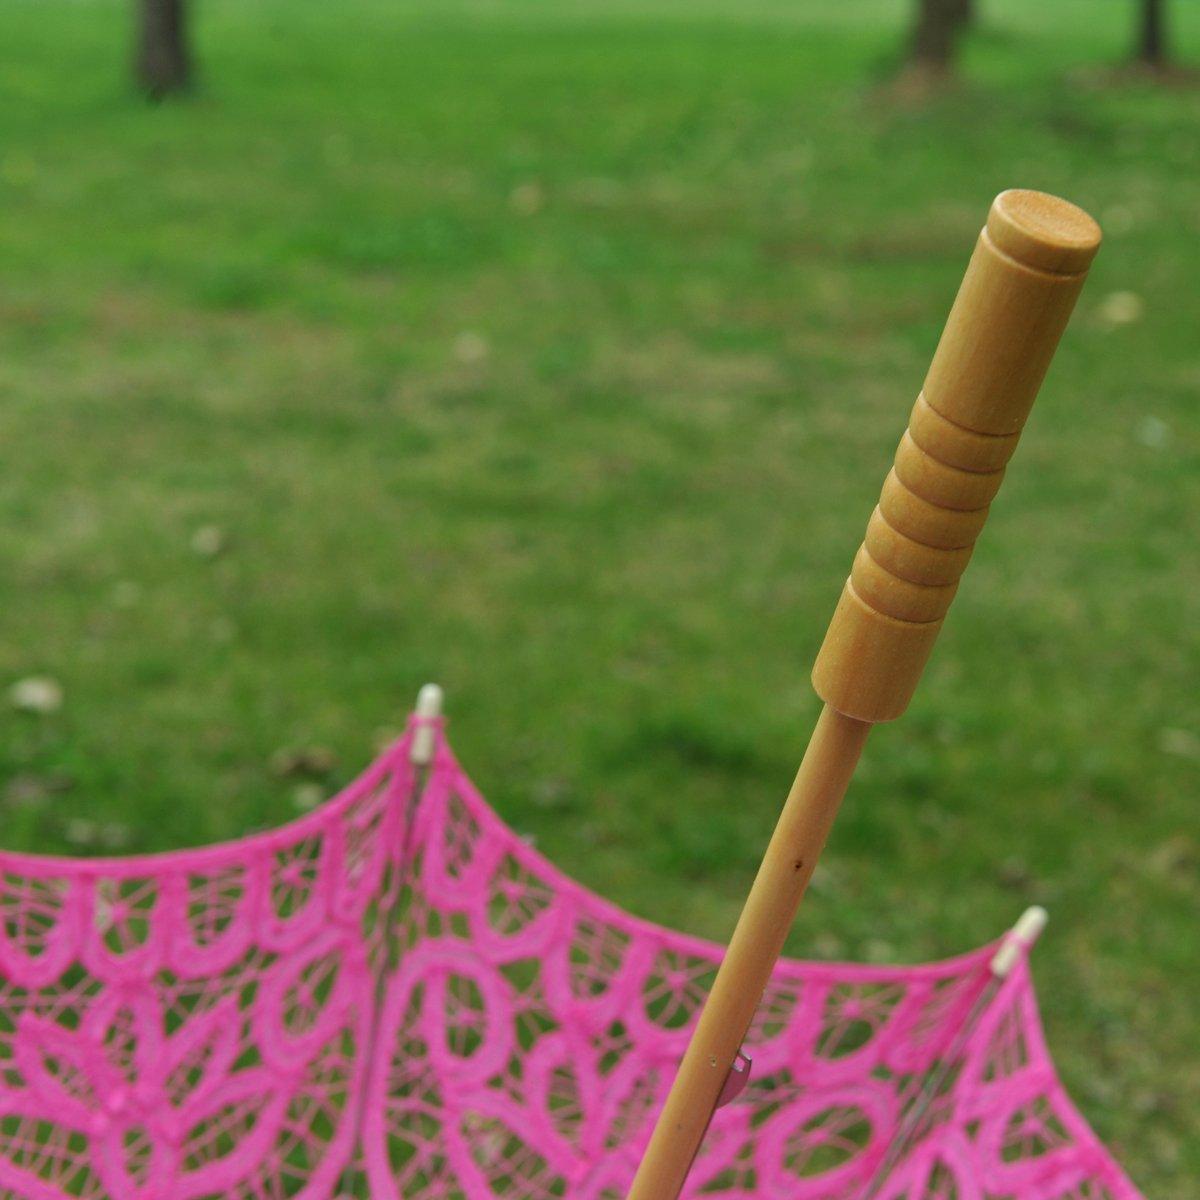 Topwedding Classic Cotton Lace Parasol Umbrella Bridal Shower Decoration, Fuschia by Topwedding (Image #10)